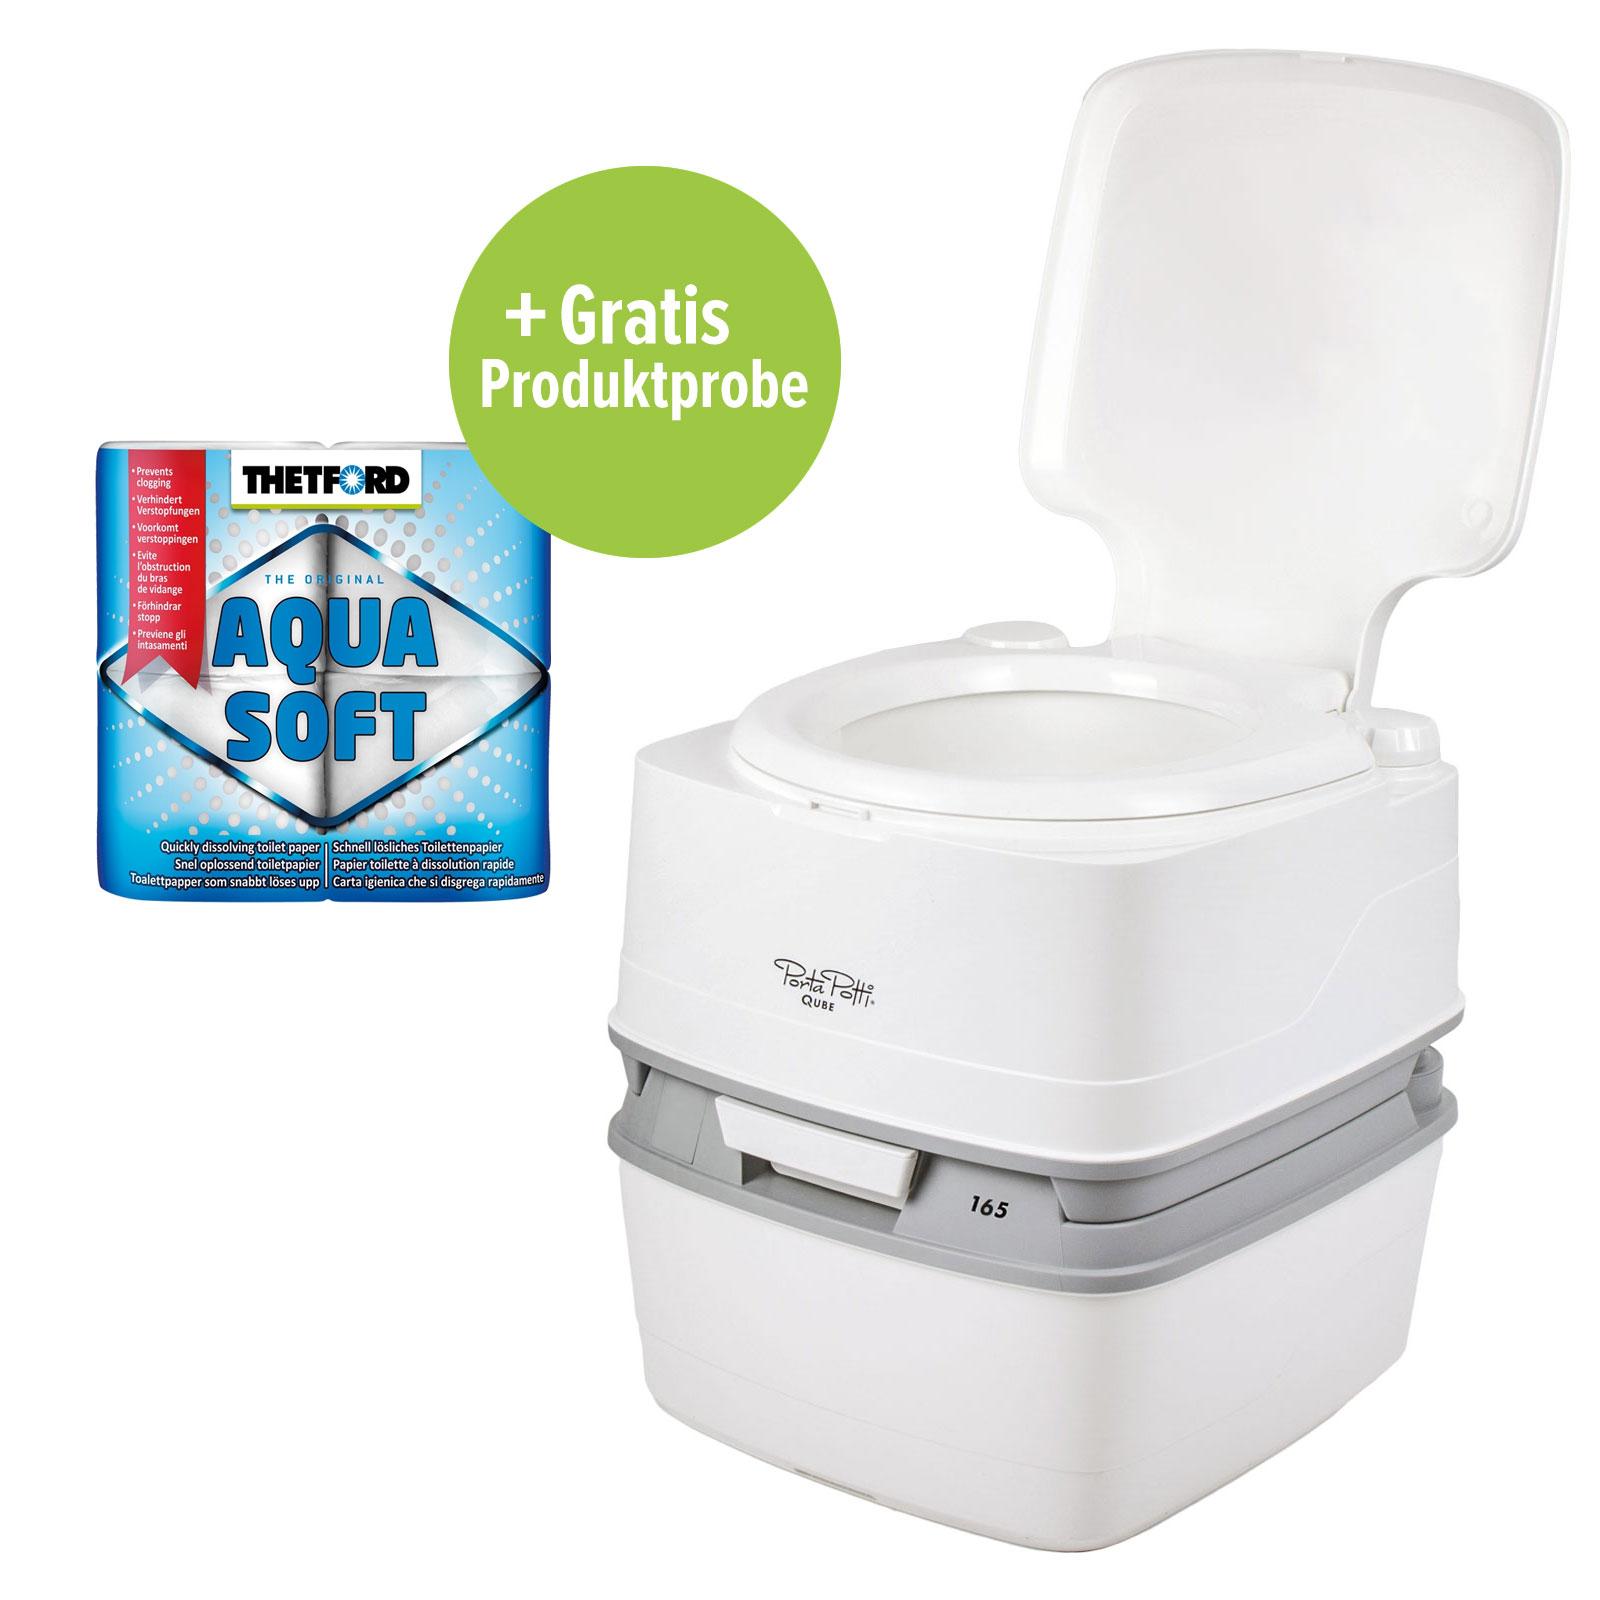 Porta potti qube 165 campingtoilette 21ltr toilettenpapier f r wohnmobil ebay - Camping toilette fur gartenhaus ...